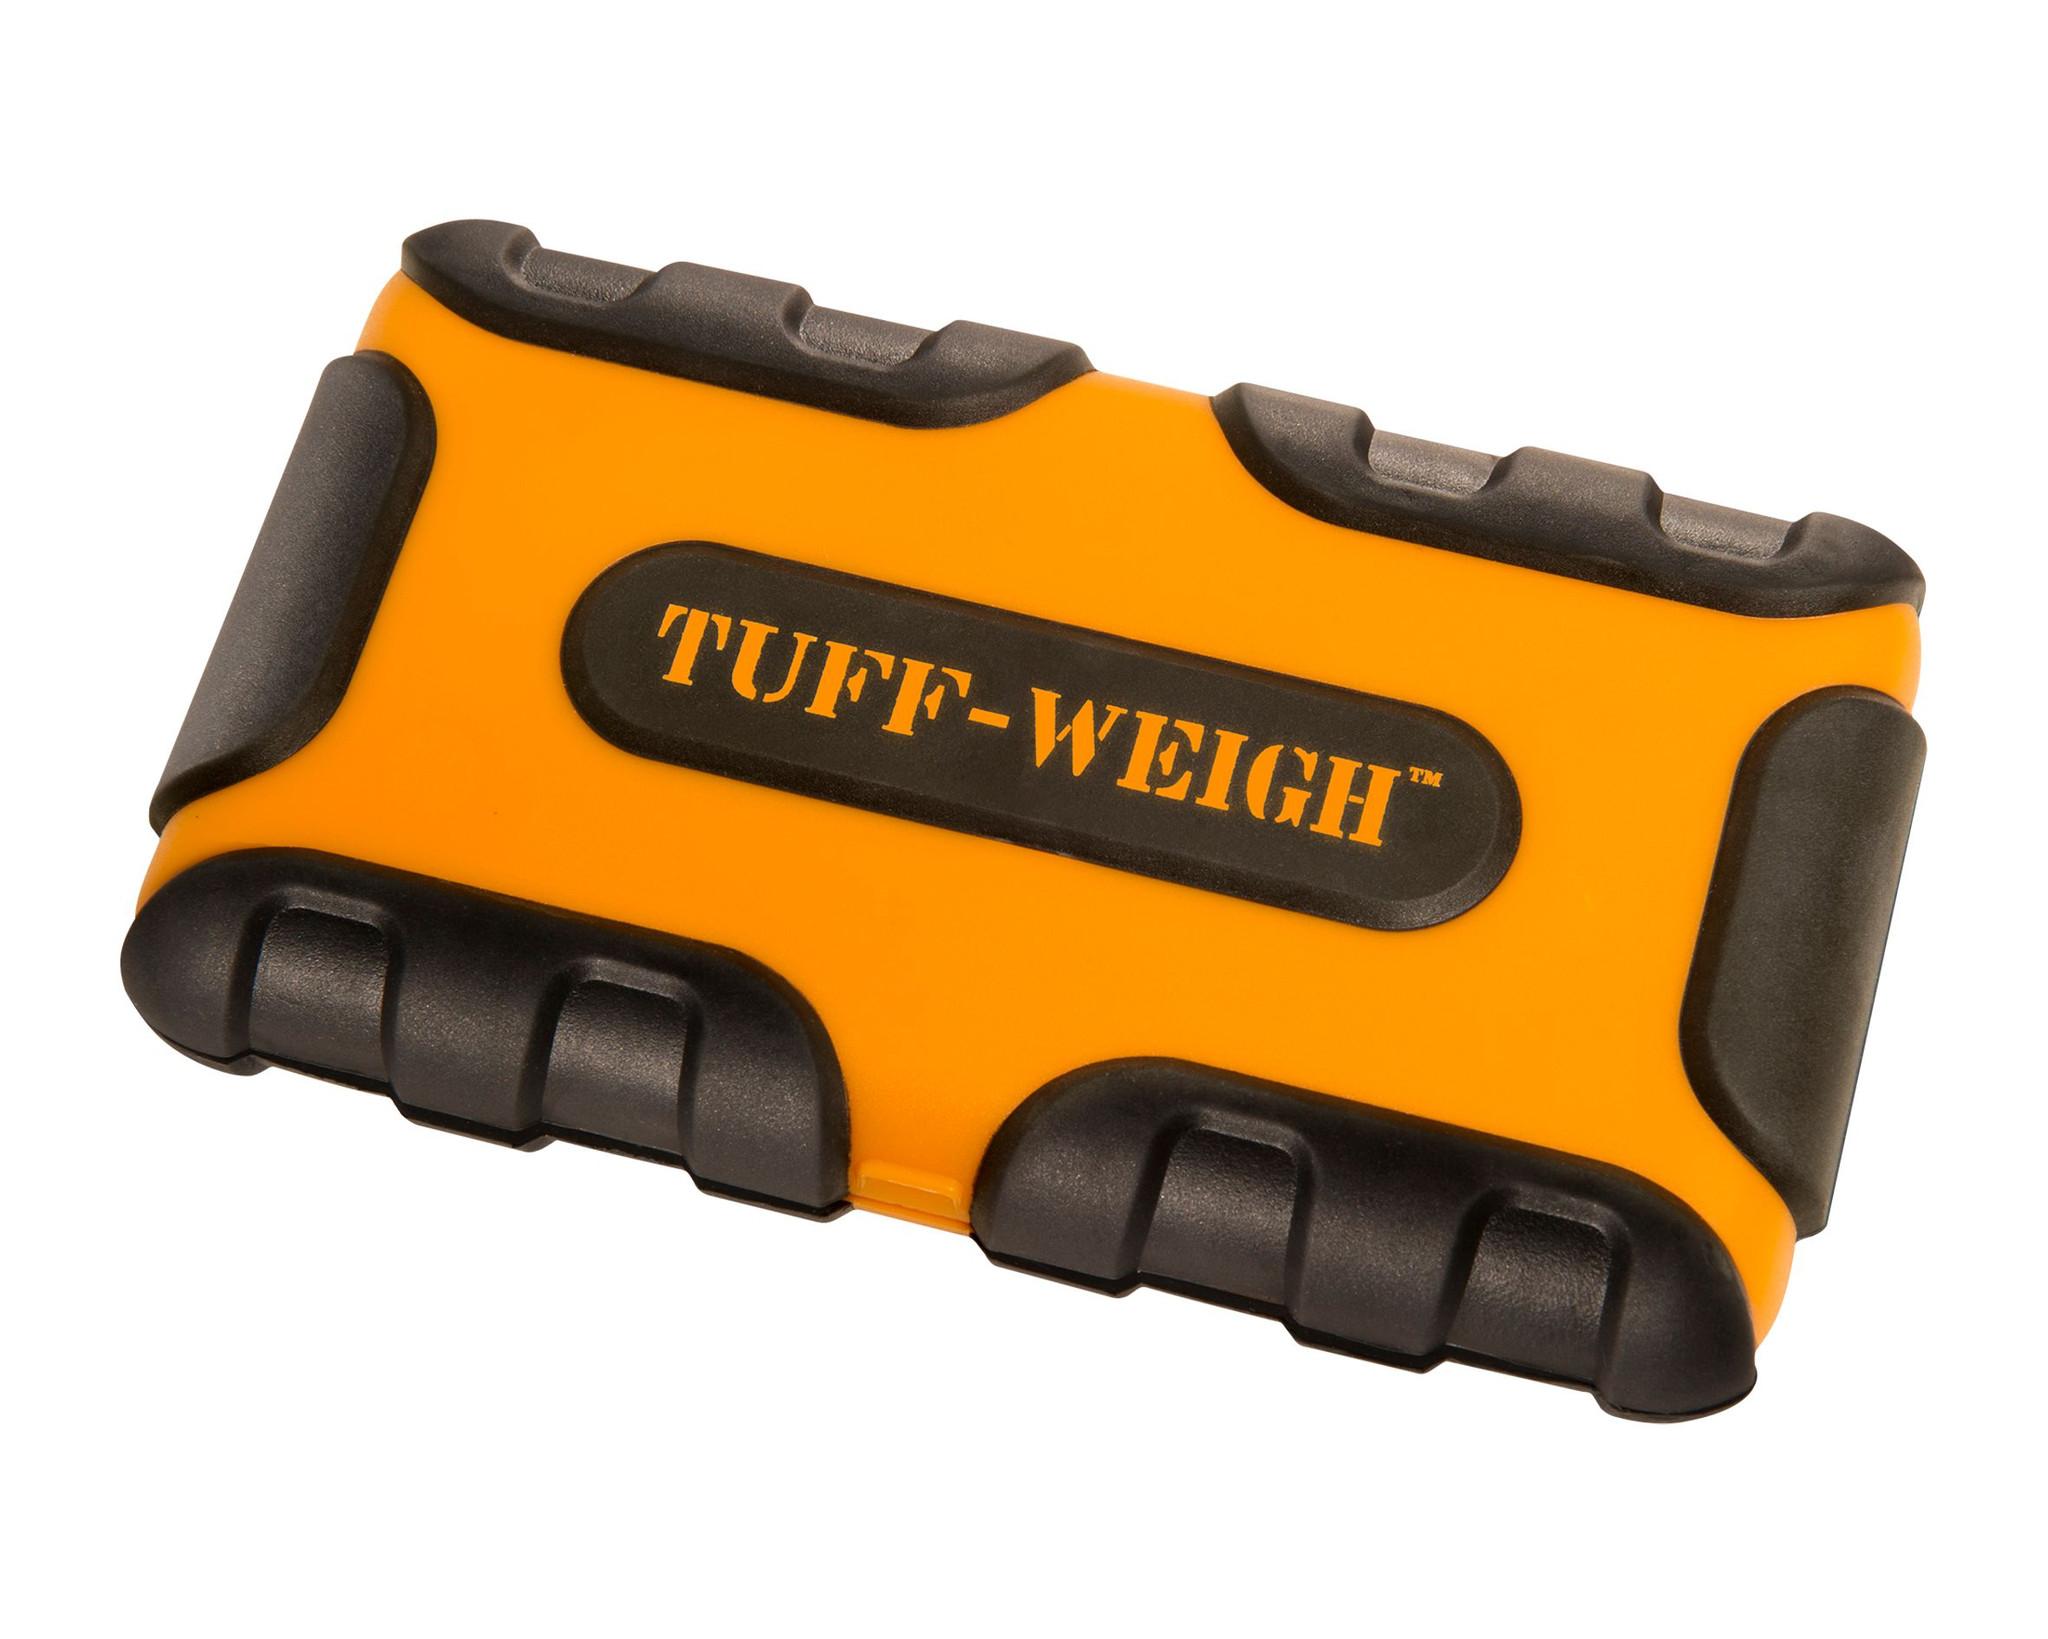 On Balance Tuff-Weigh Scale 100g x 0.01g